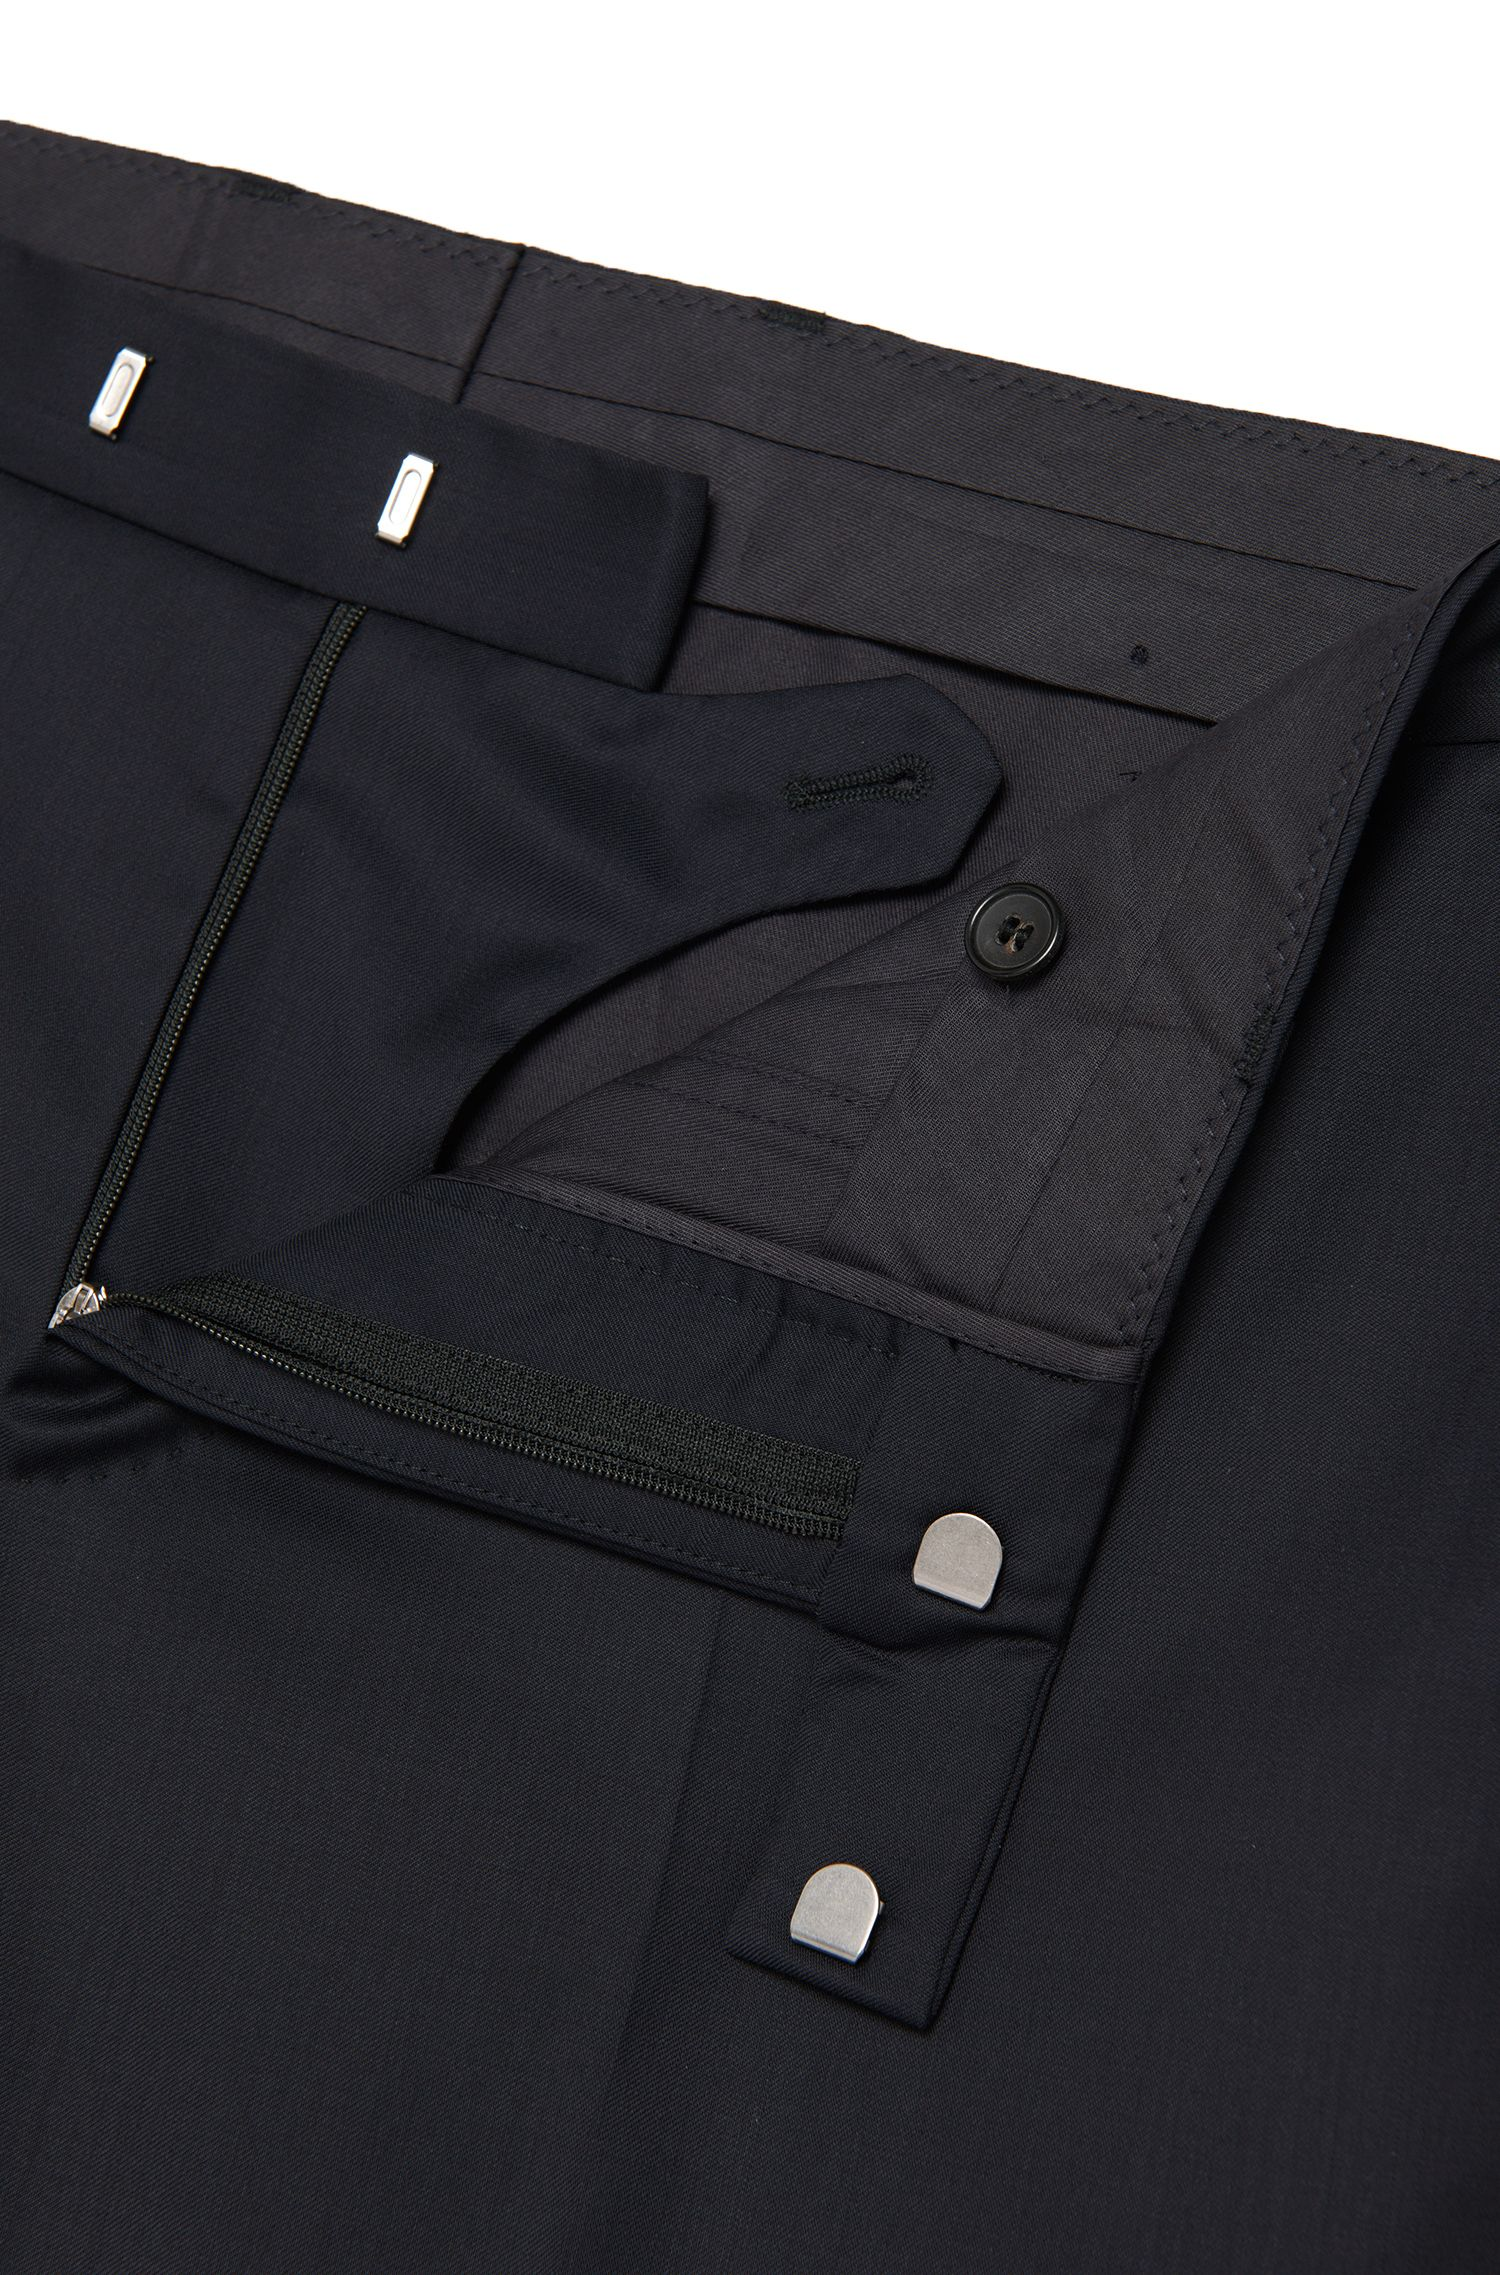 Pantalón Tailored slim fit en pura lana virgen: 'T-Court5', Azul oscuro